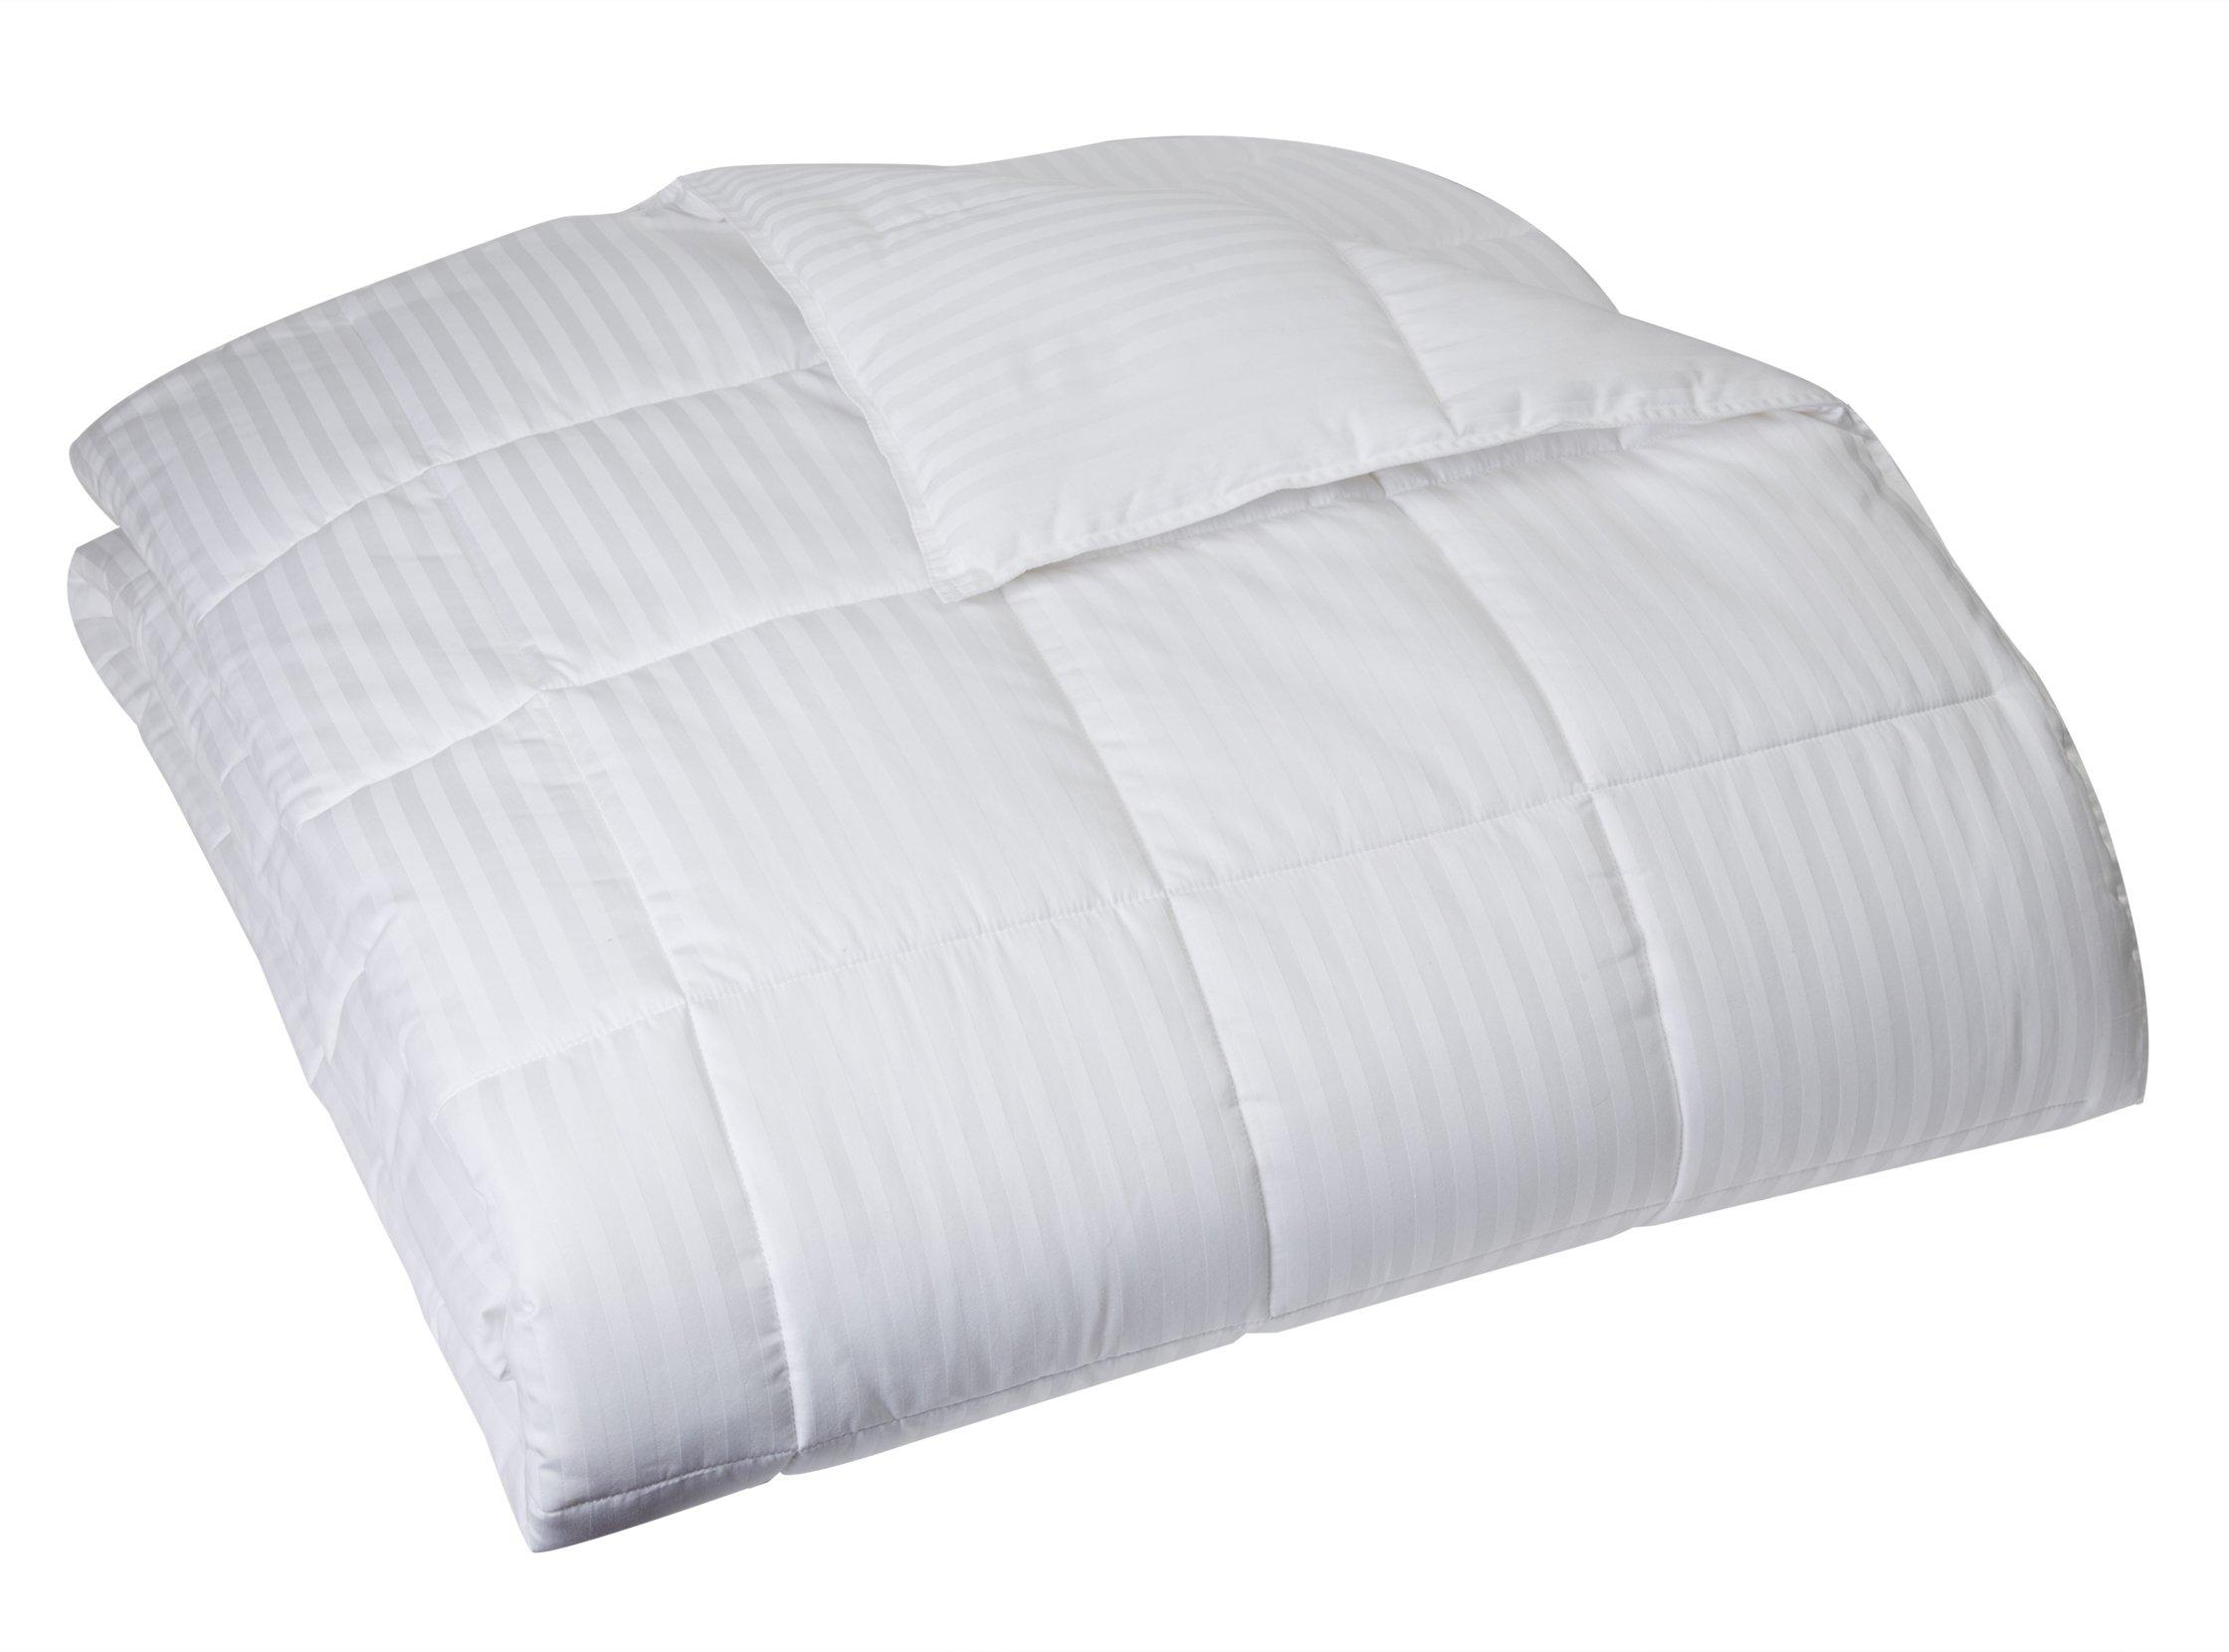 GoodNight Sleep 400 Thread Count Hypo-Allergenic Down Alternative Comforter, Queen